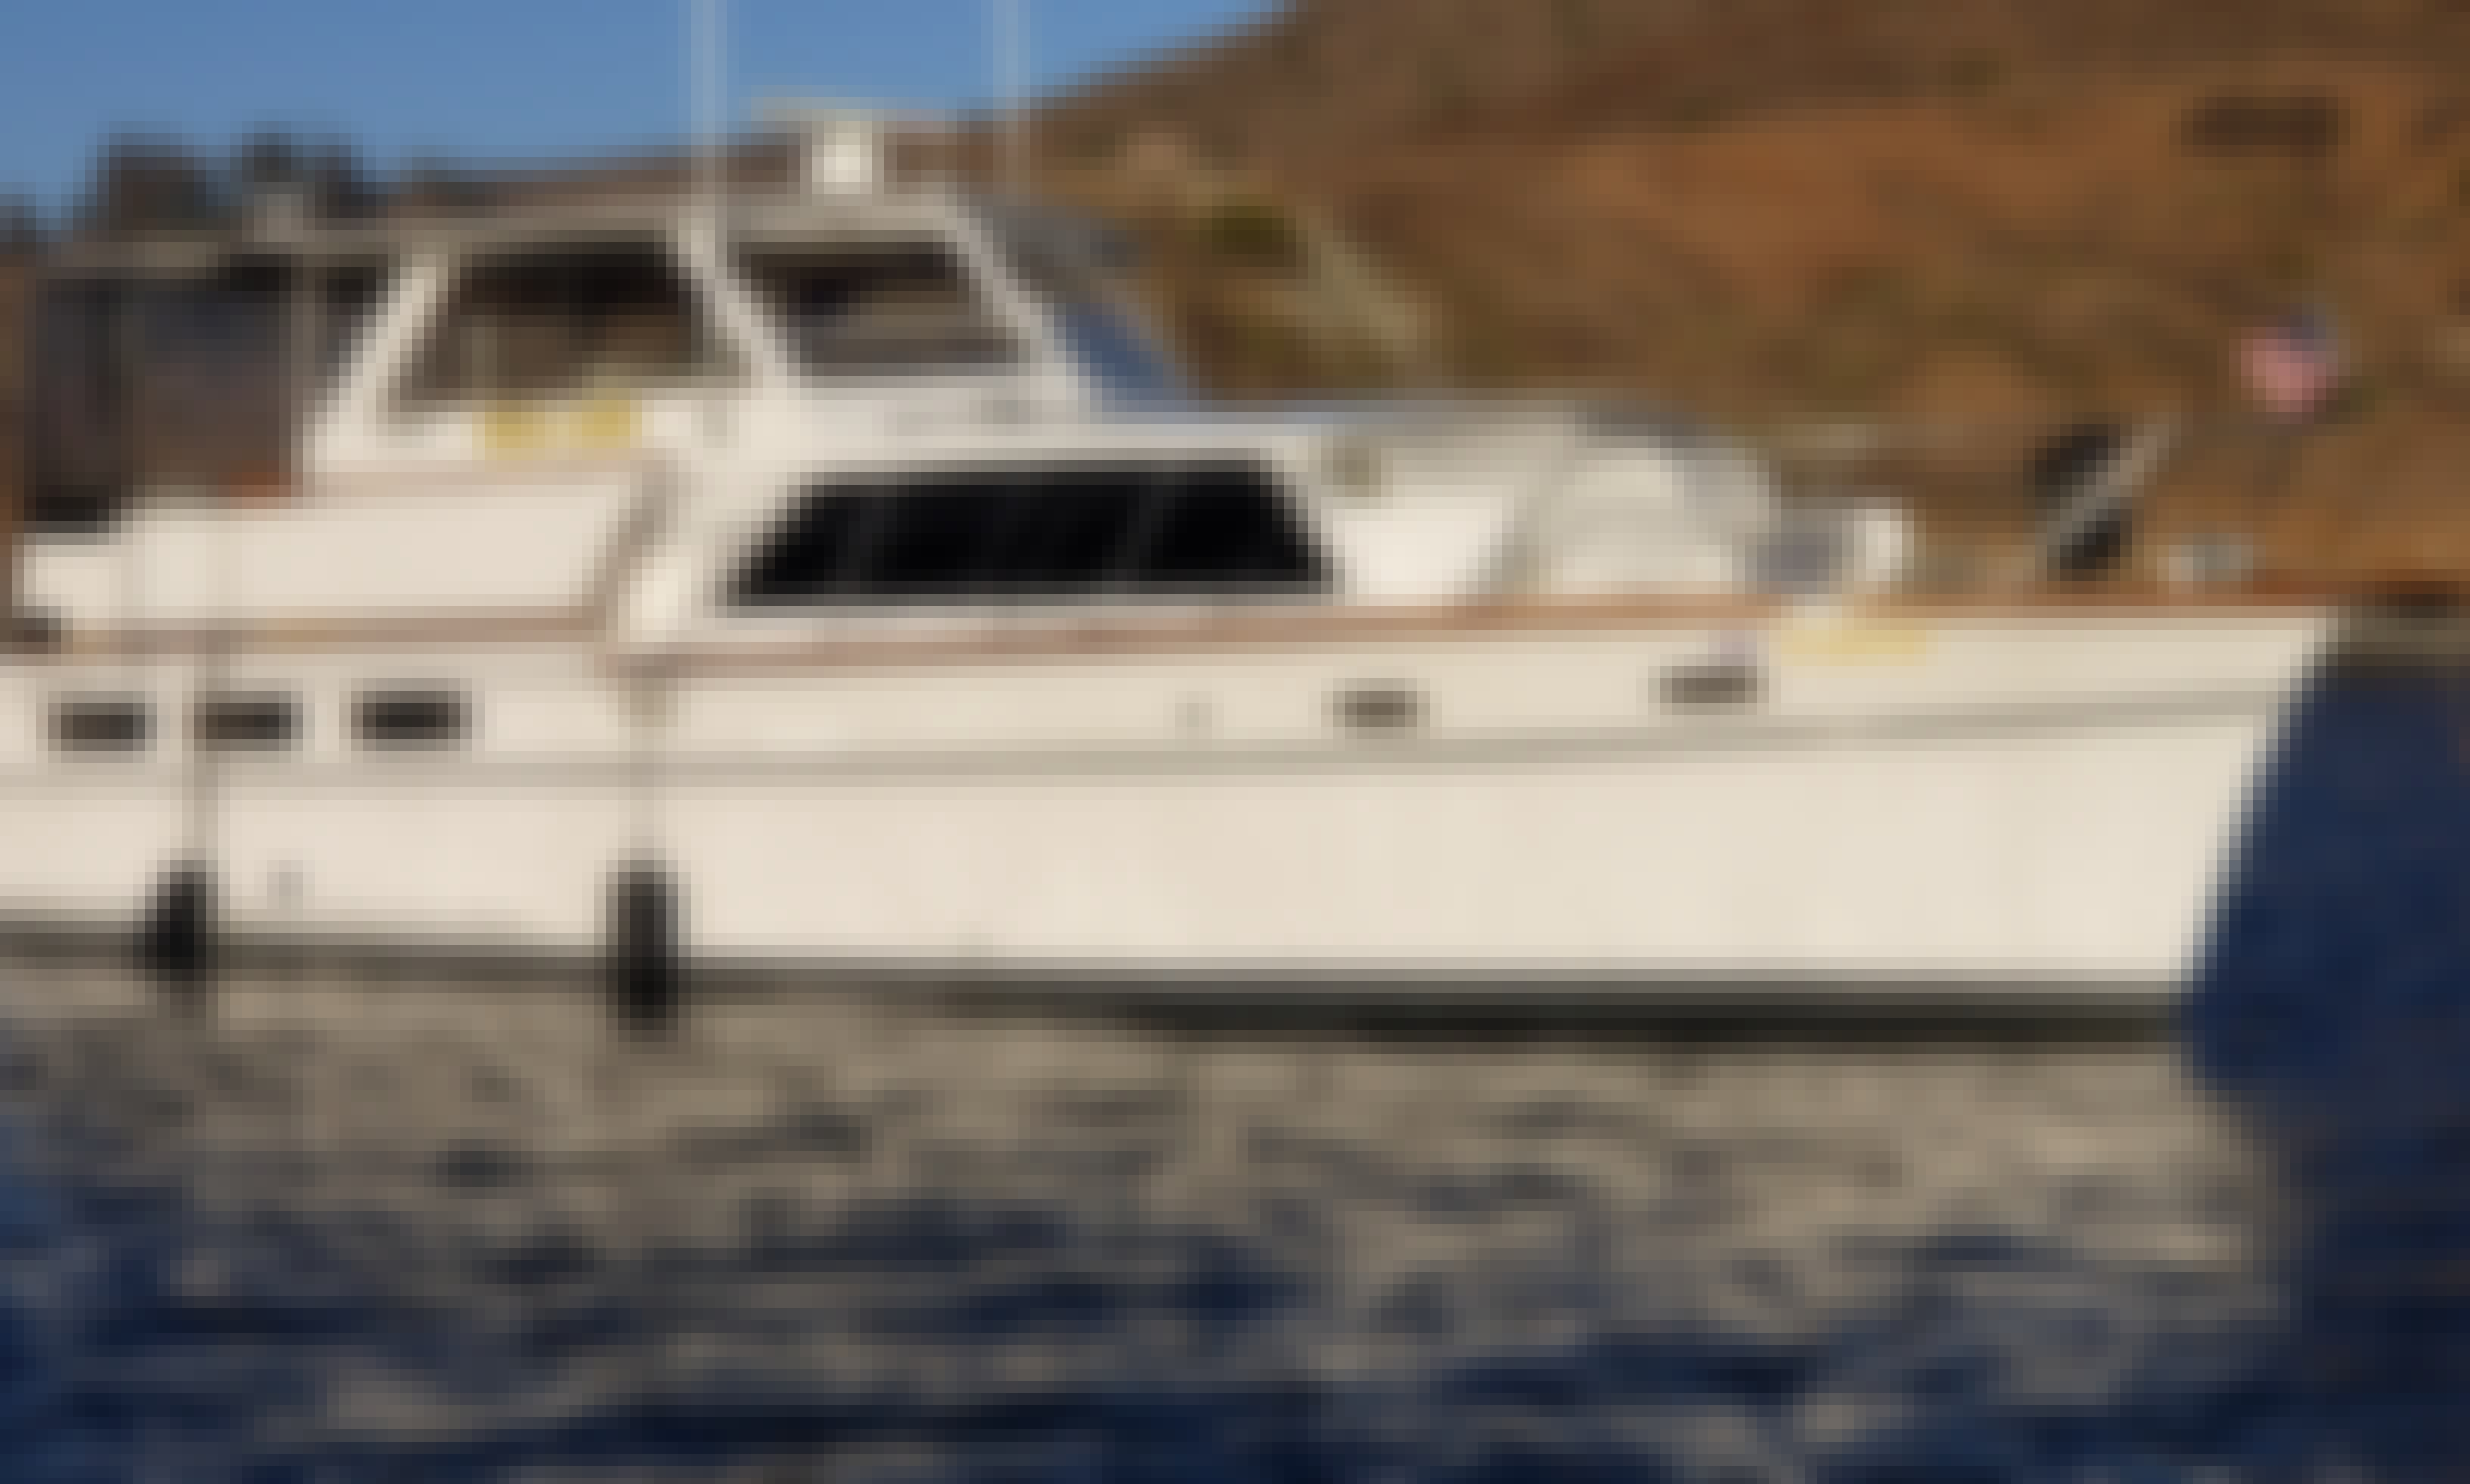 Classic Wooden Yacht Absolutely Beautiful! Modern Amenities